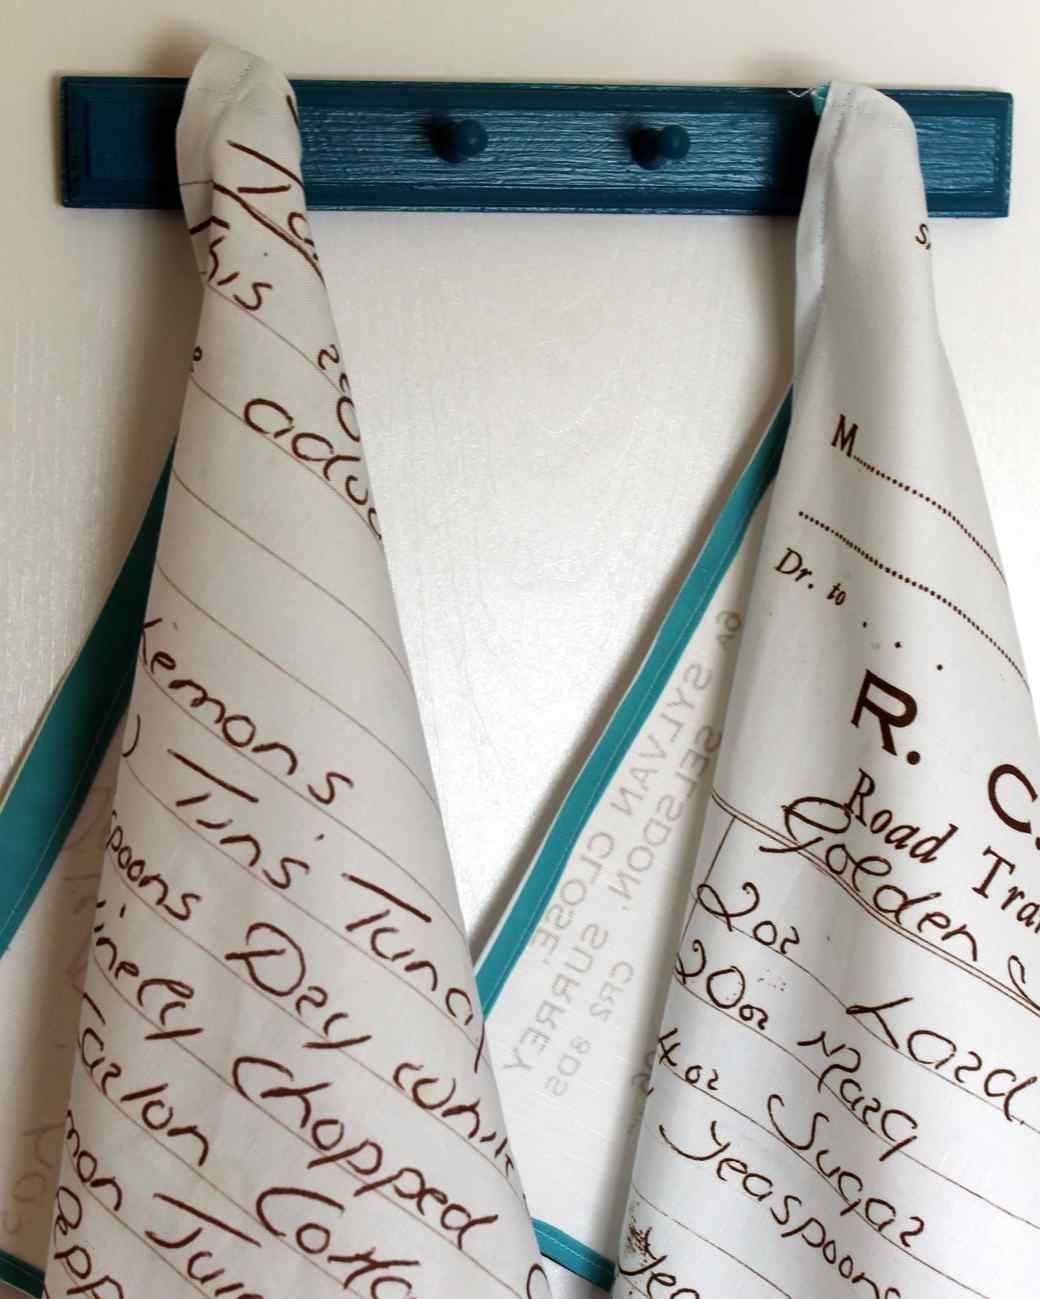 Tea Towels Made From Handwritten Recipes